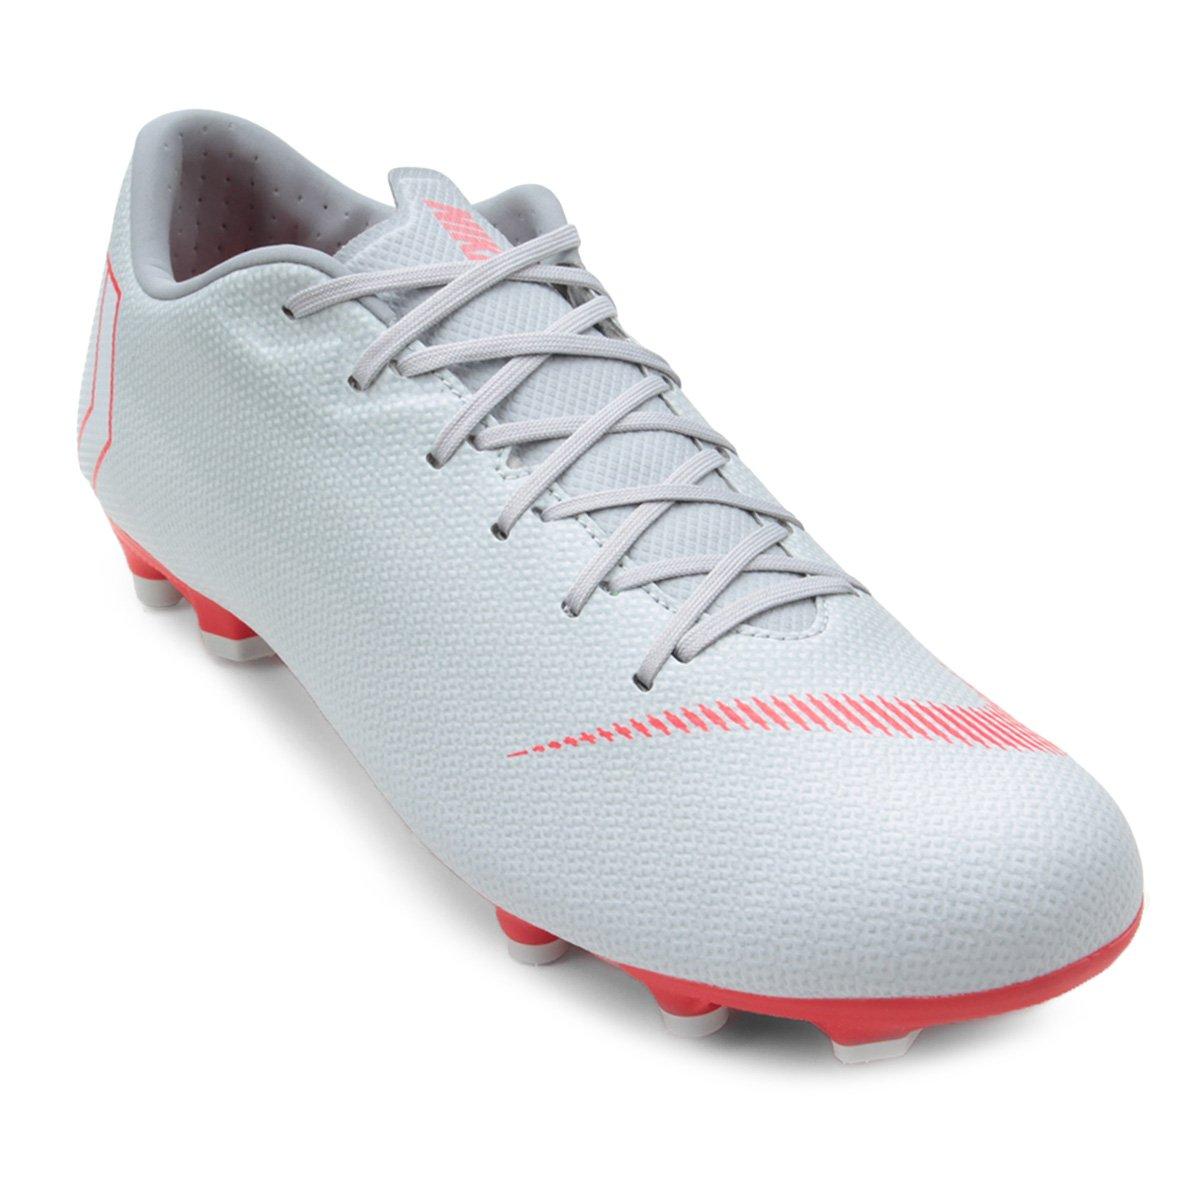 Chuteira Campo Nike Mercurial Vapor 12 Academy - Cinza - Compre ... 6947c6cca50b2